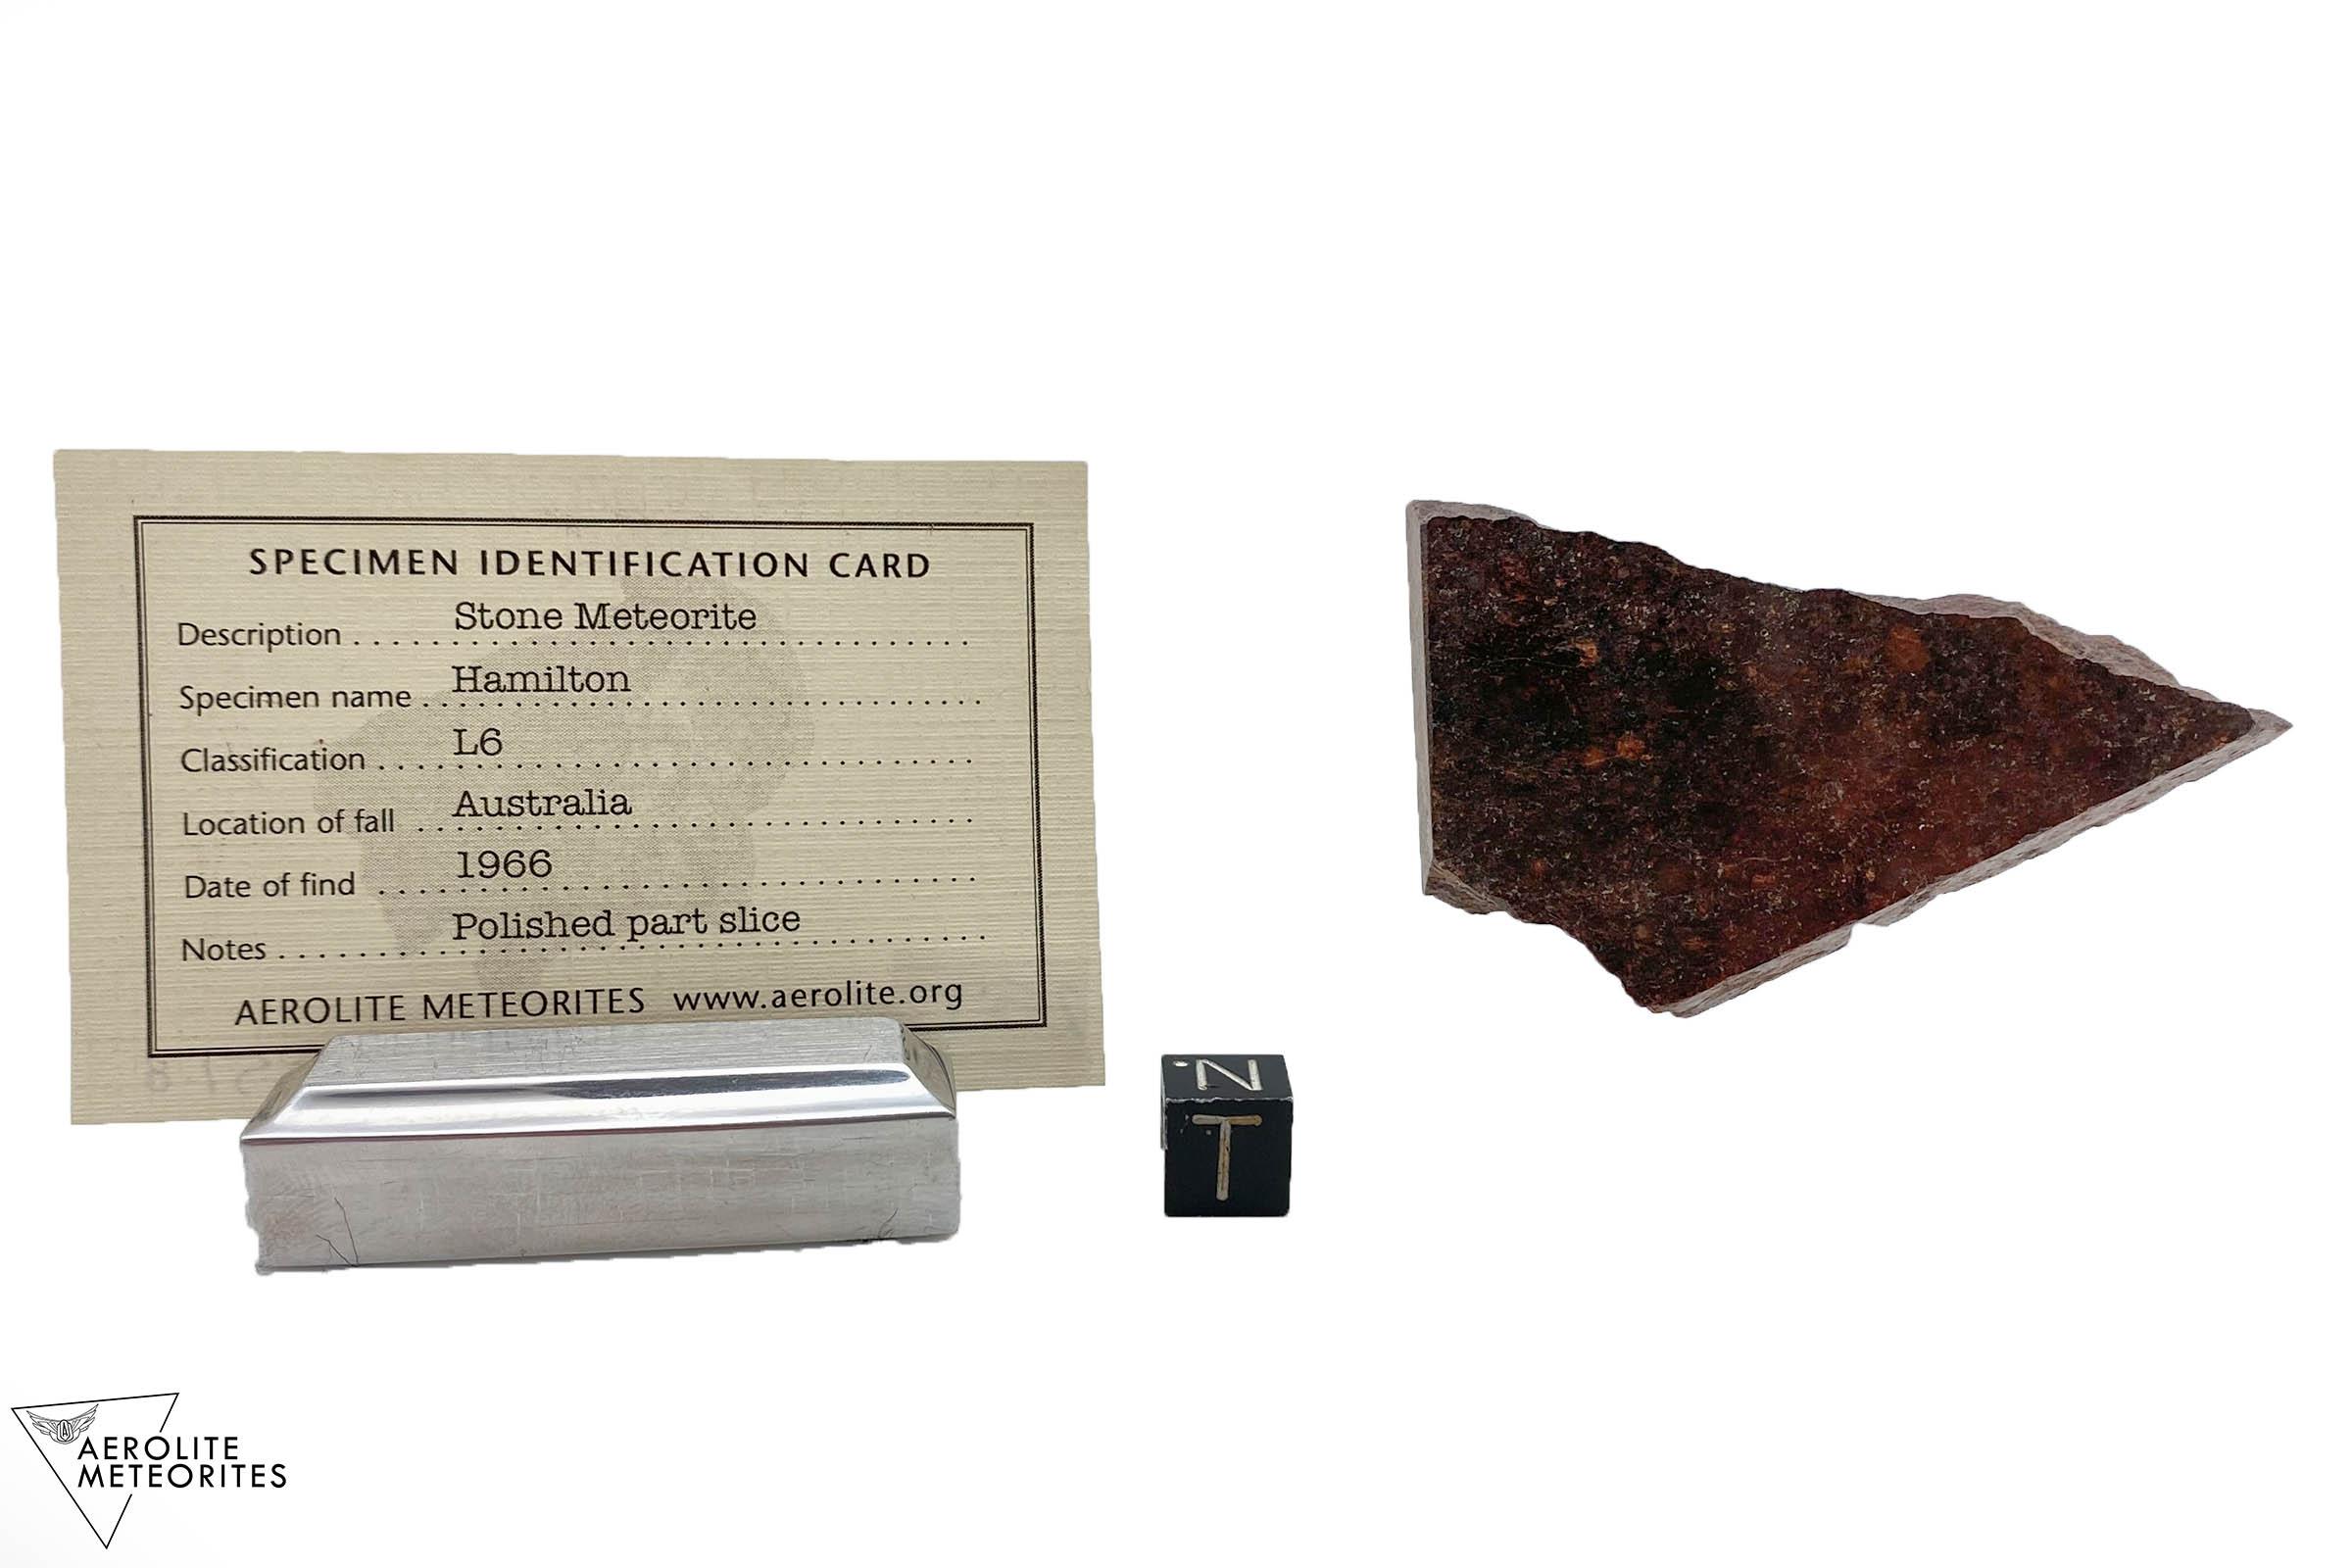 Hamilton 51.8 grams-iii